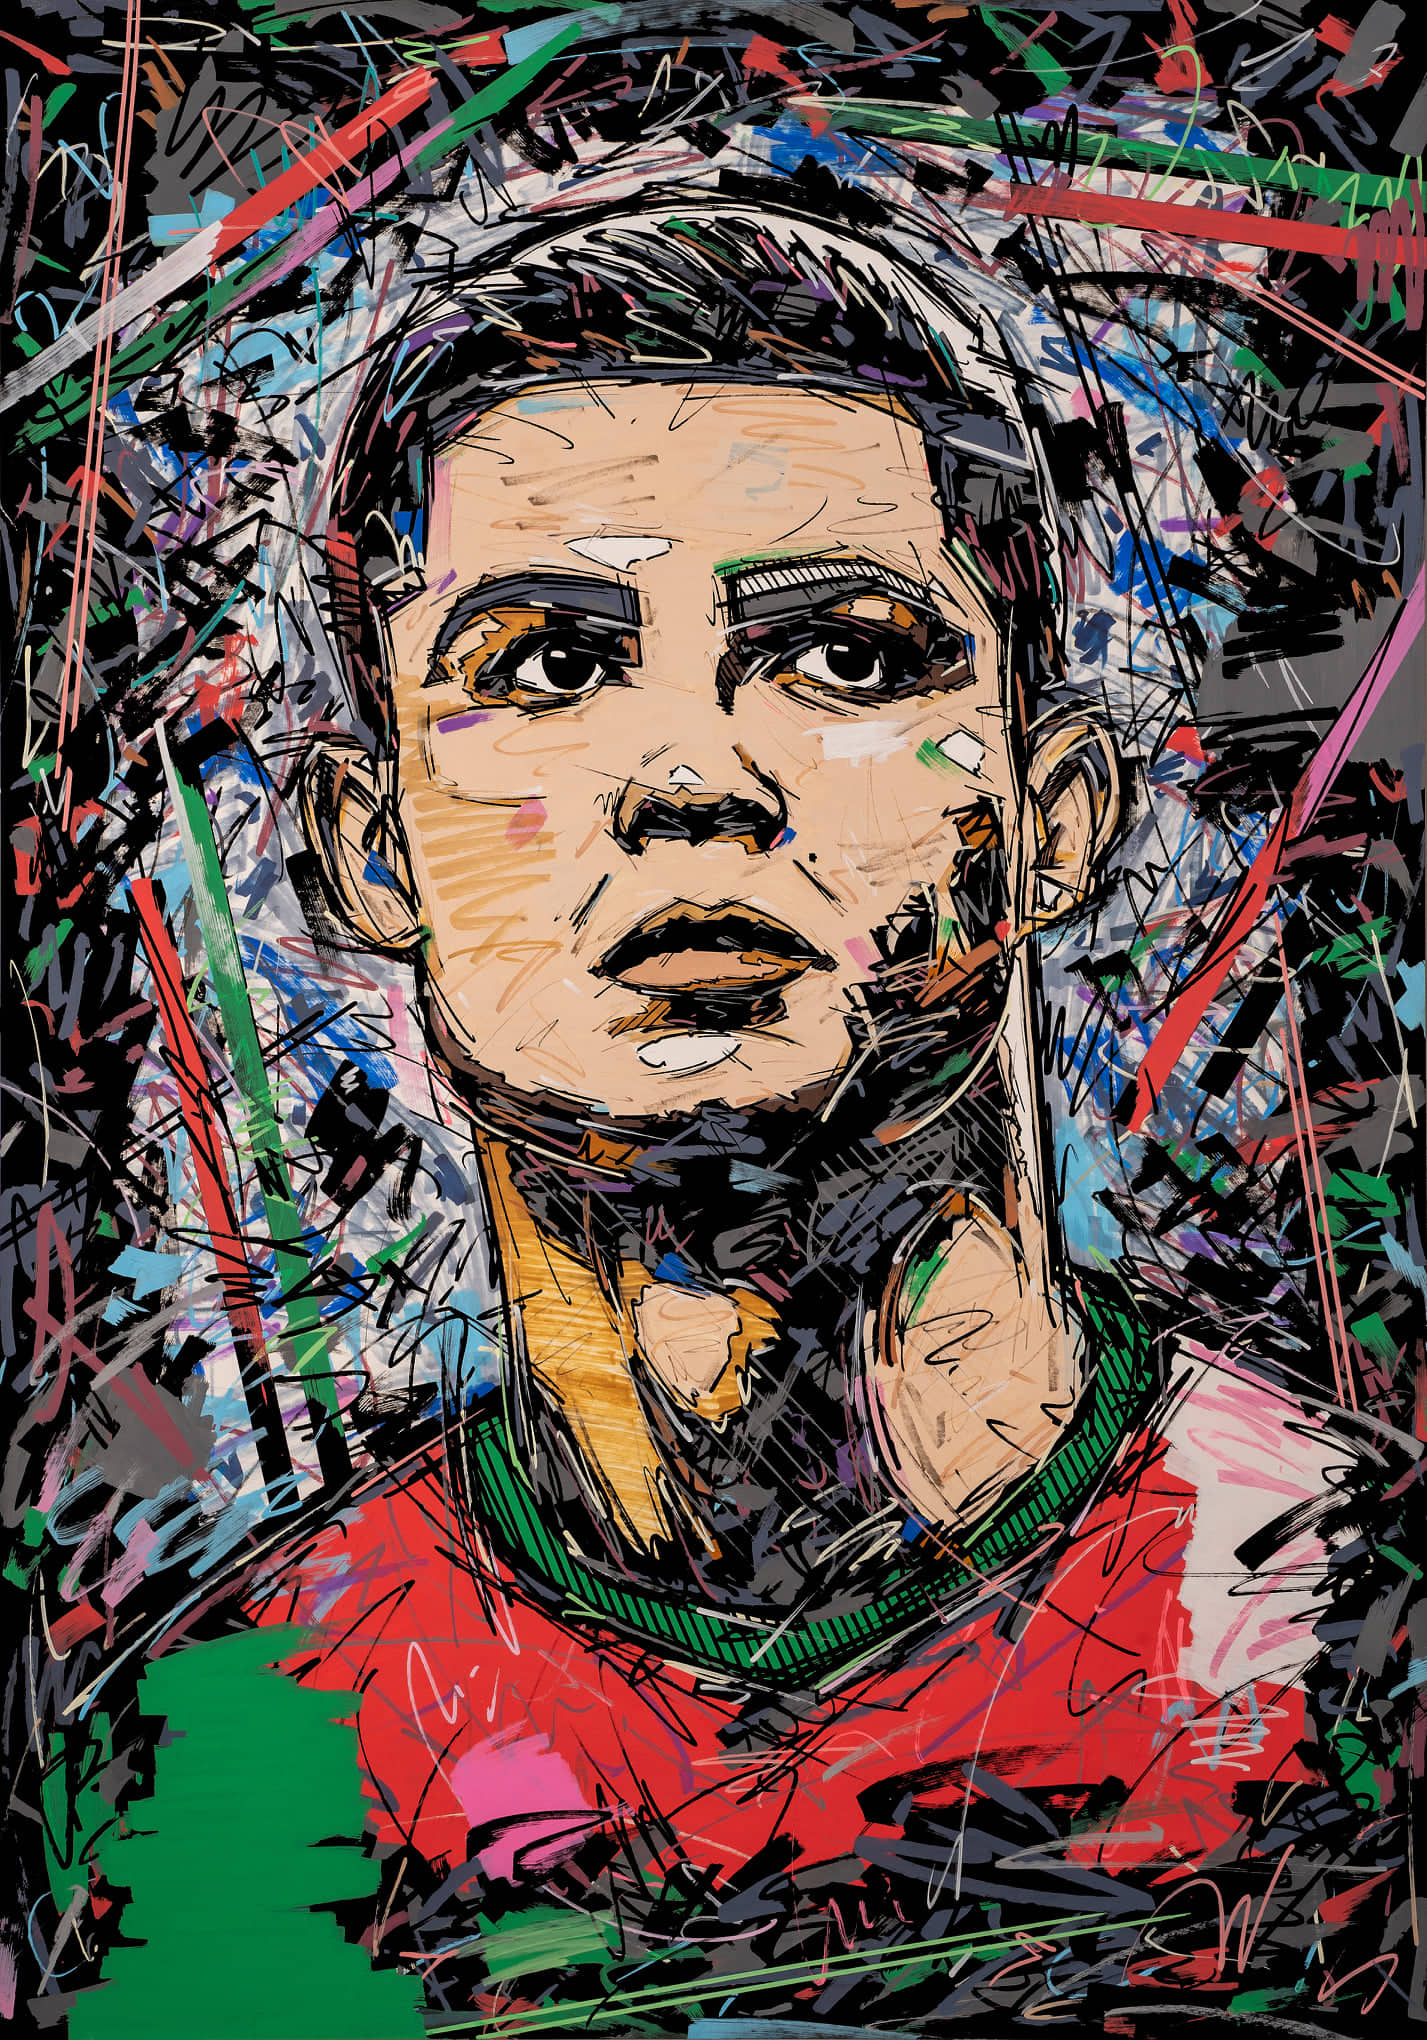 Cristiano Ronaldo , cr7 , portugal , 1xrun , soccer art , ivan beslic , artisbullshit , ronaldo art